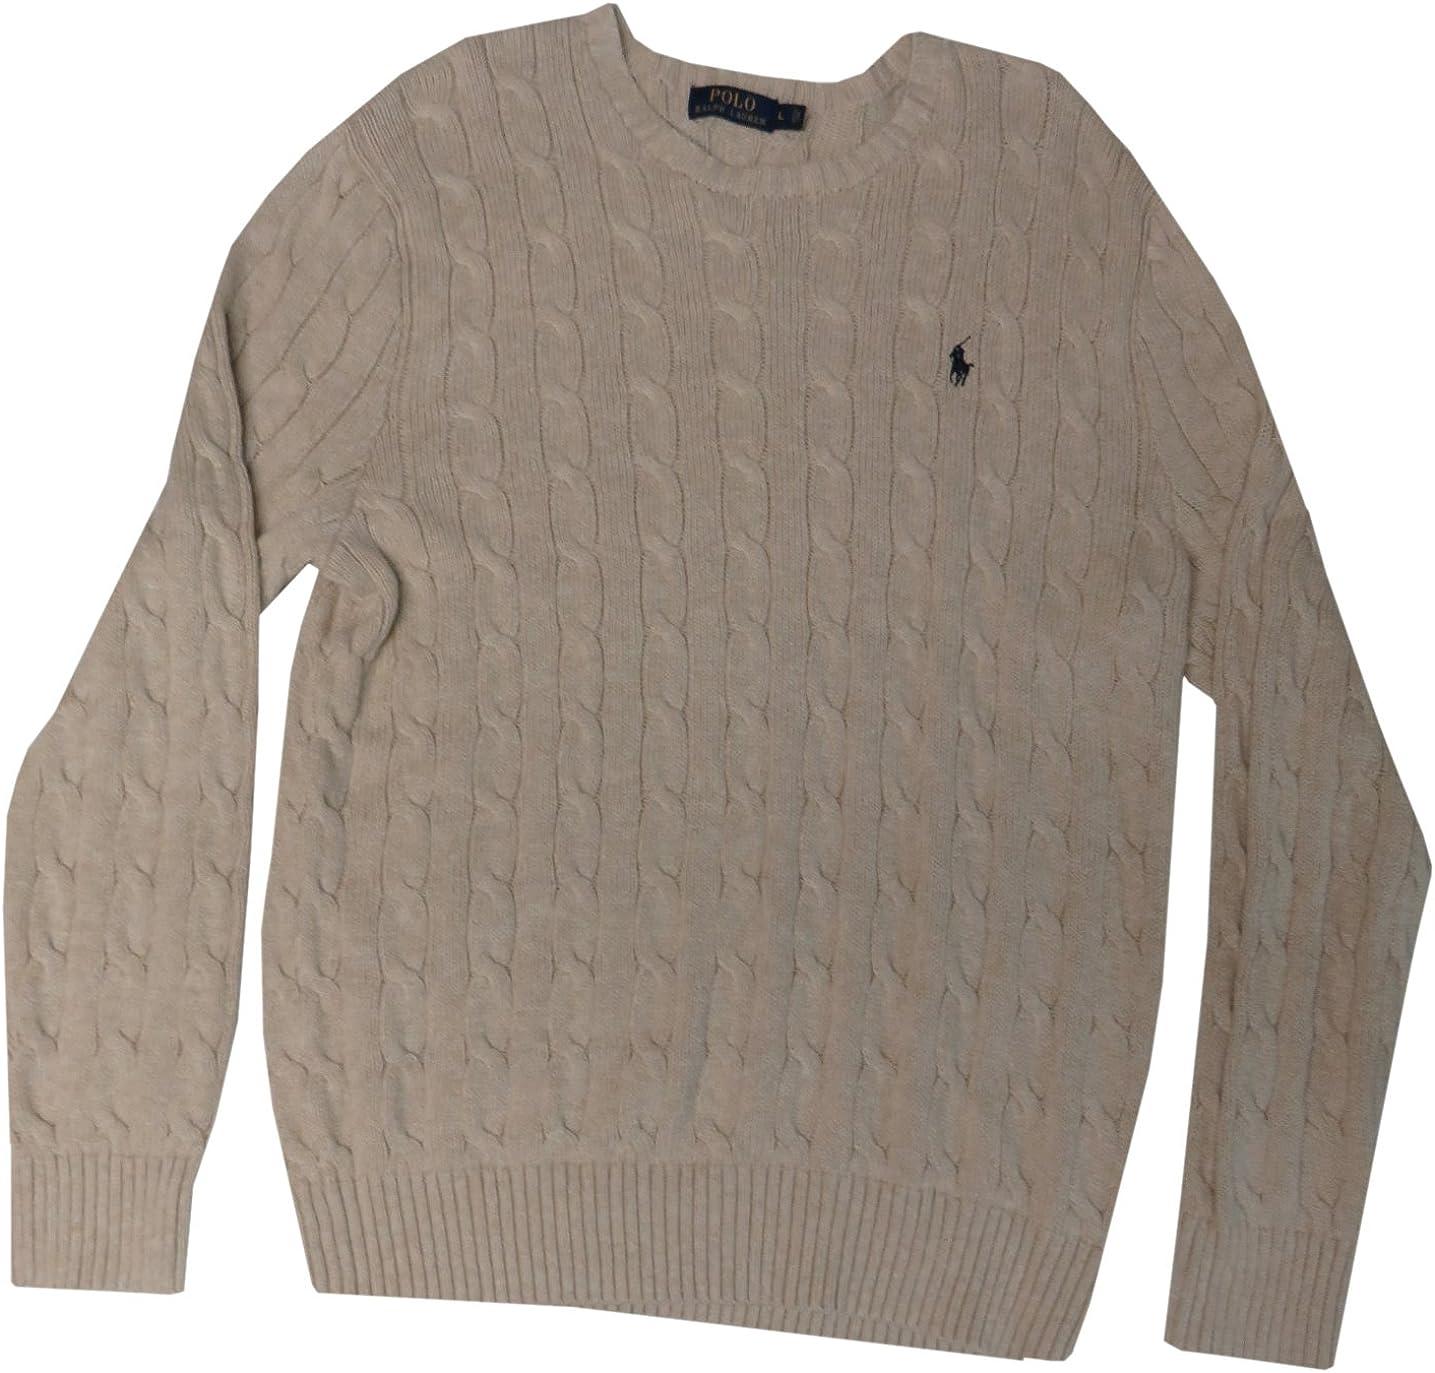 LAUREN RALPH LAUREN Women's Pullover Cableknit Sweater, Size Large, Oatmeal/Tan